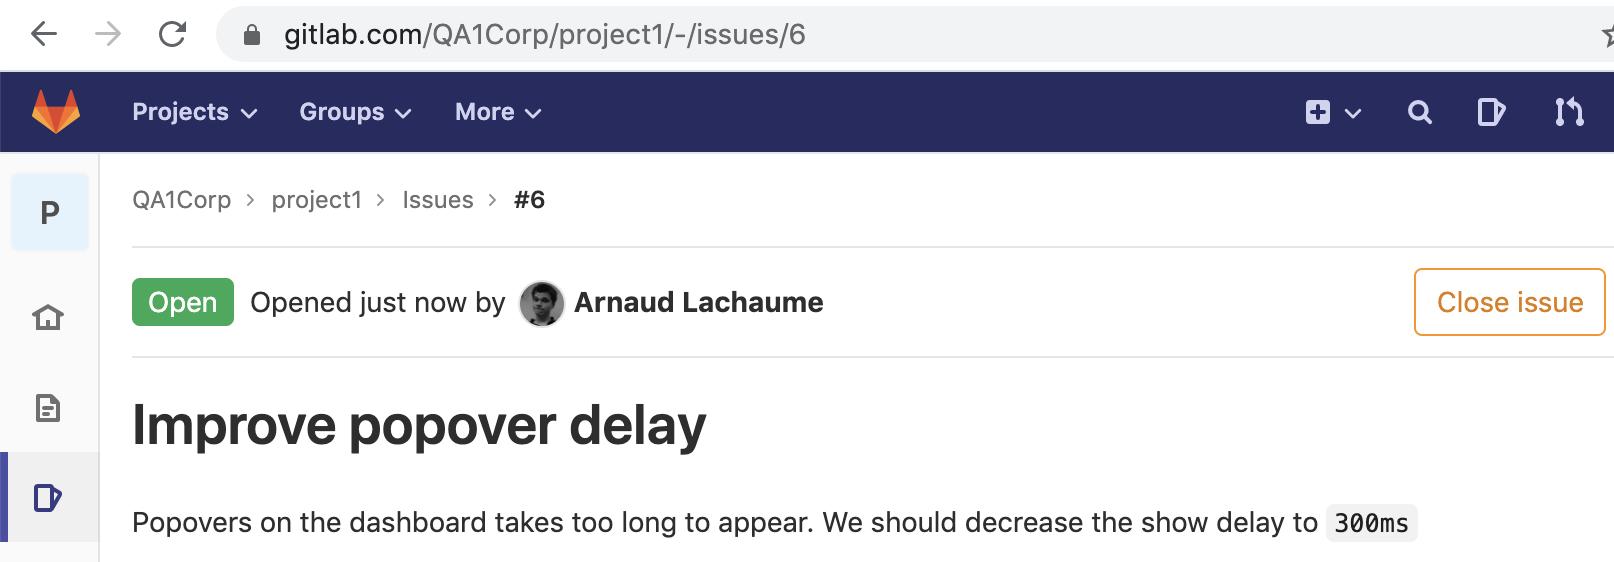 link via commit via GitLab